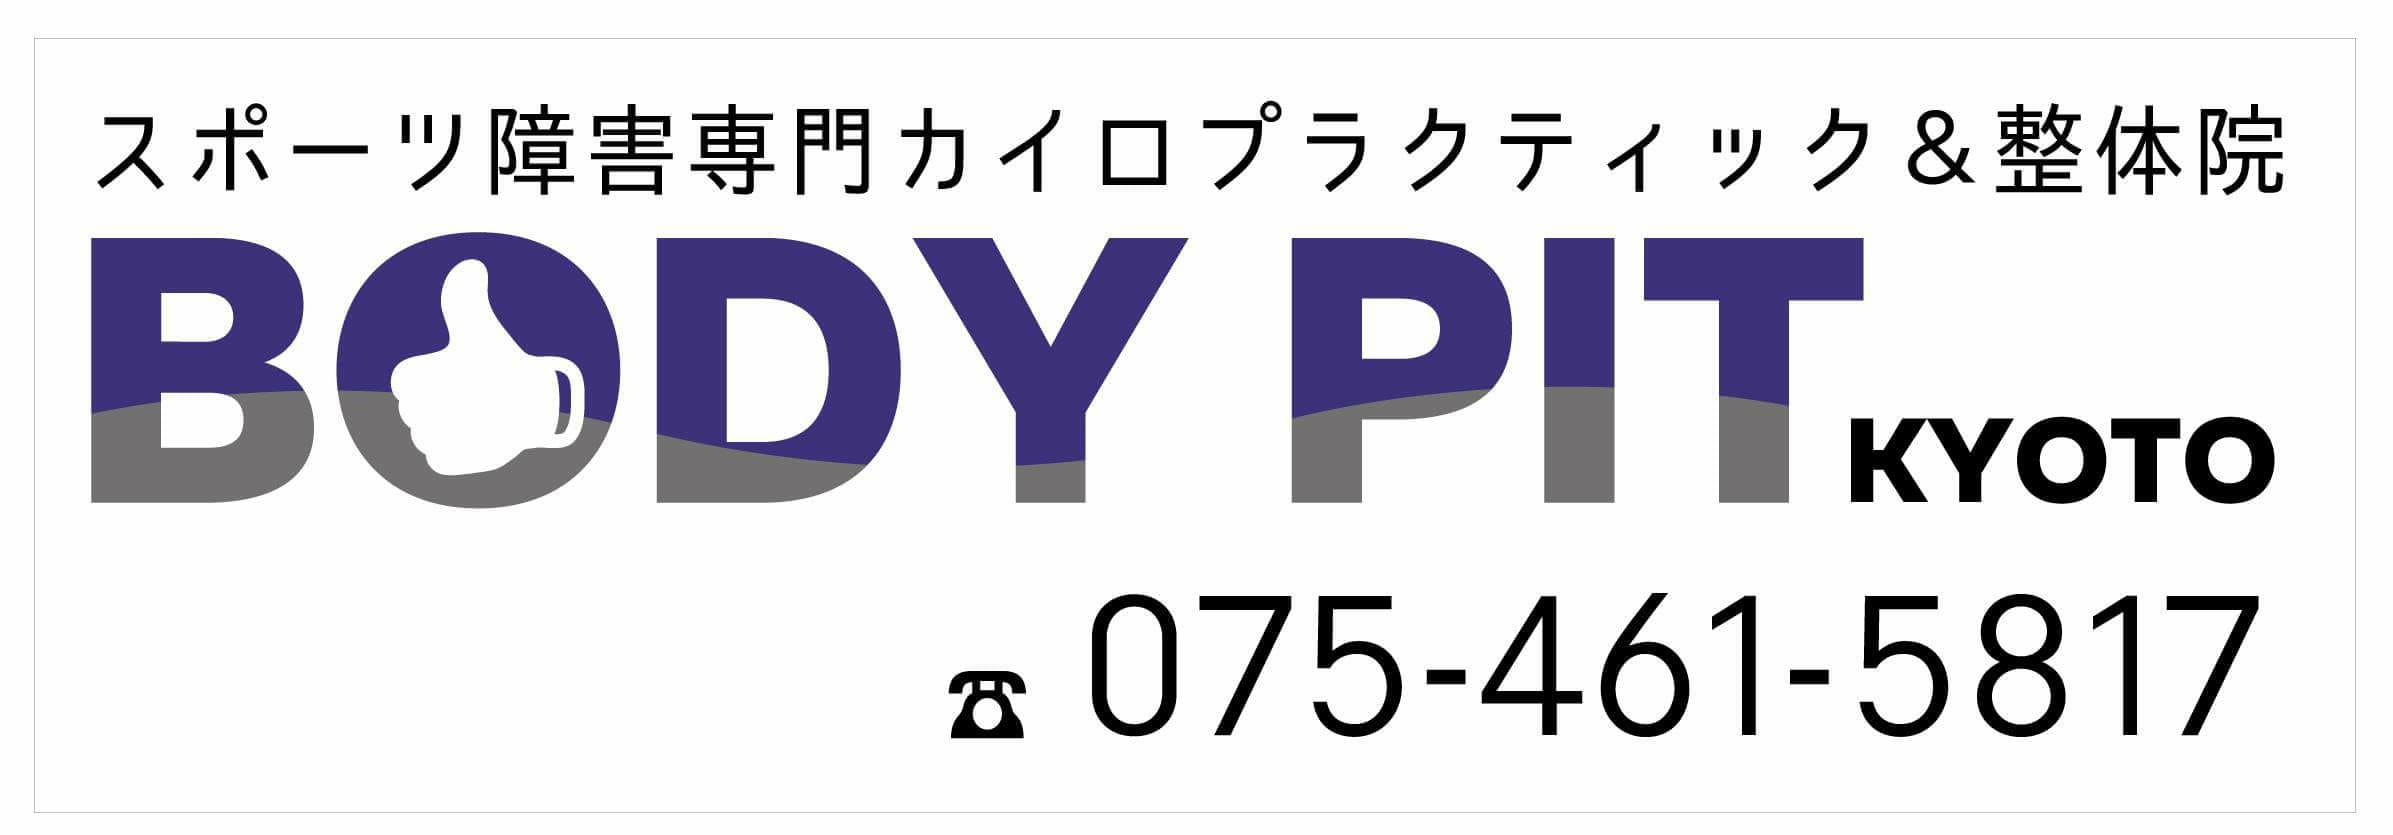 BODY PIT KYOTO